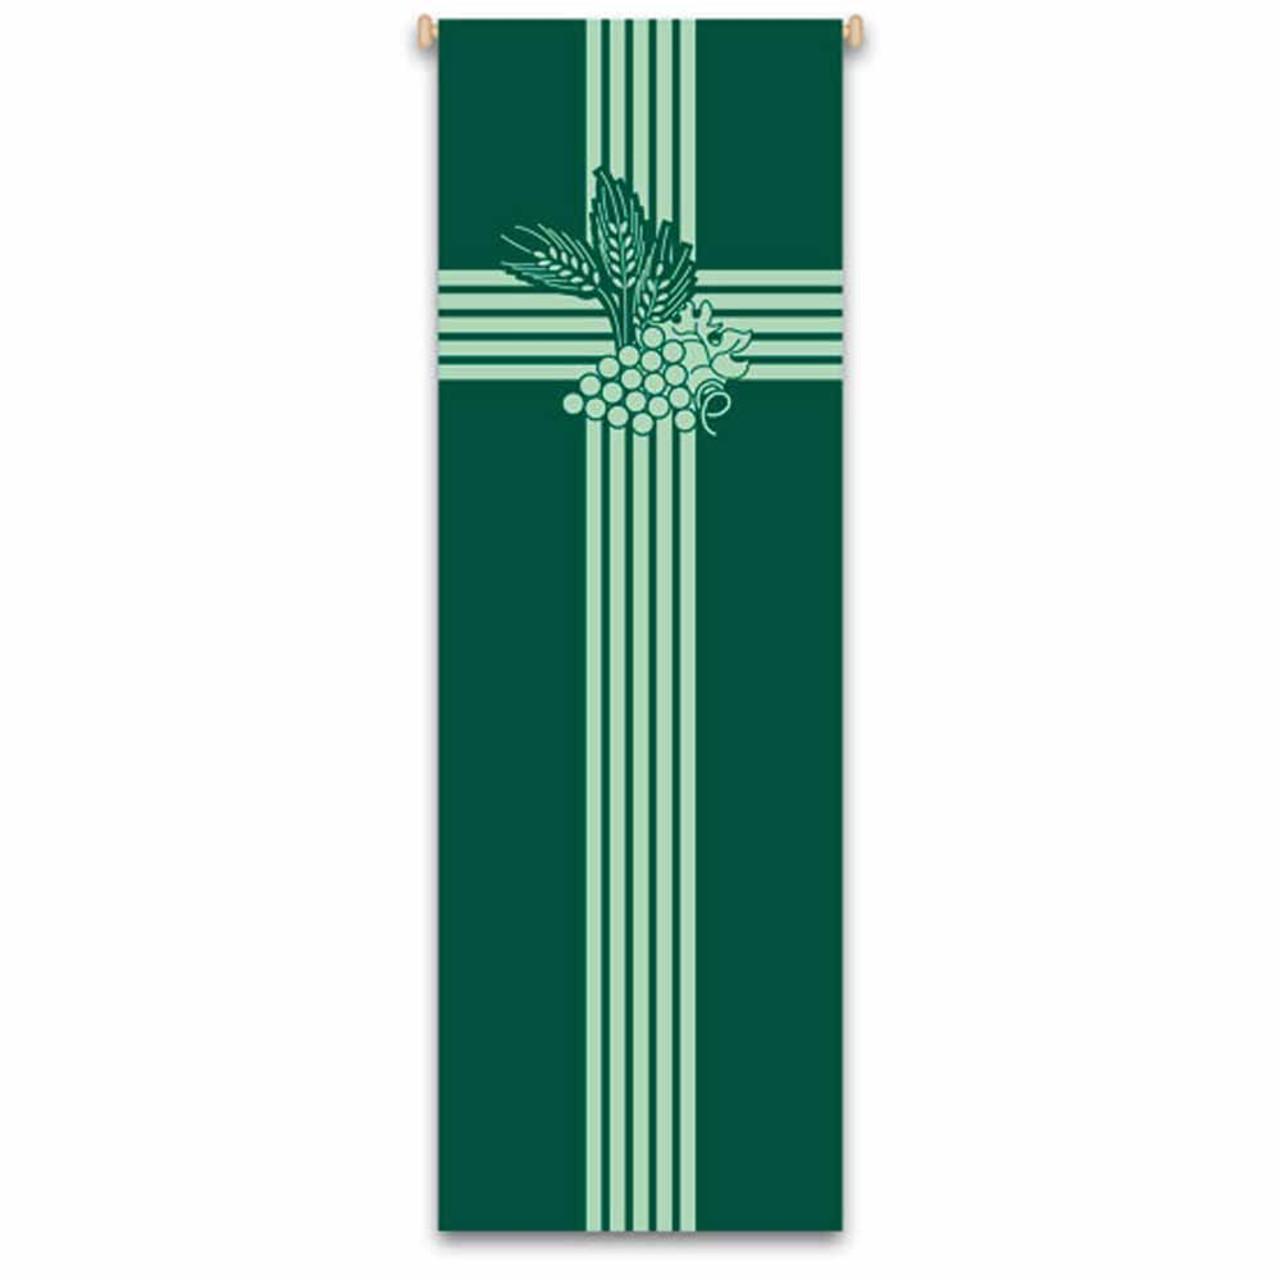 7114 Eucharist Banner w/Wheat and Grapes Design